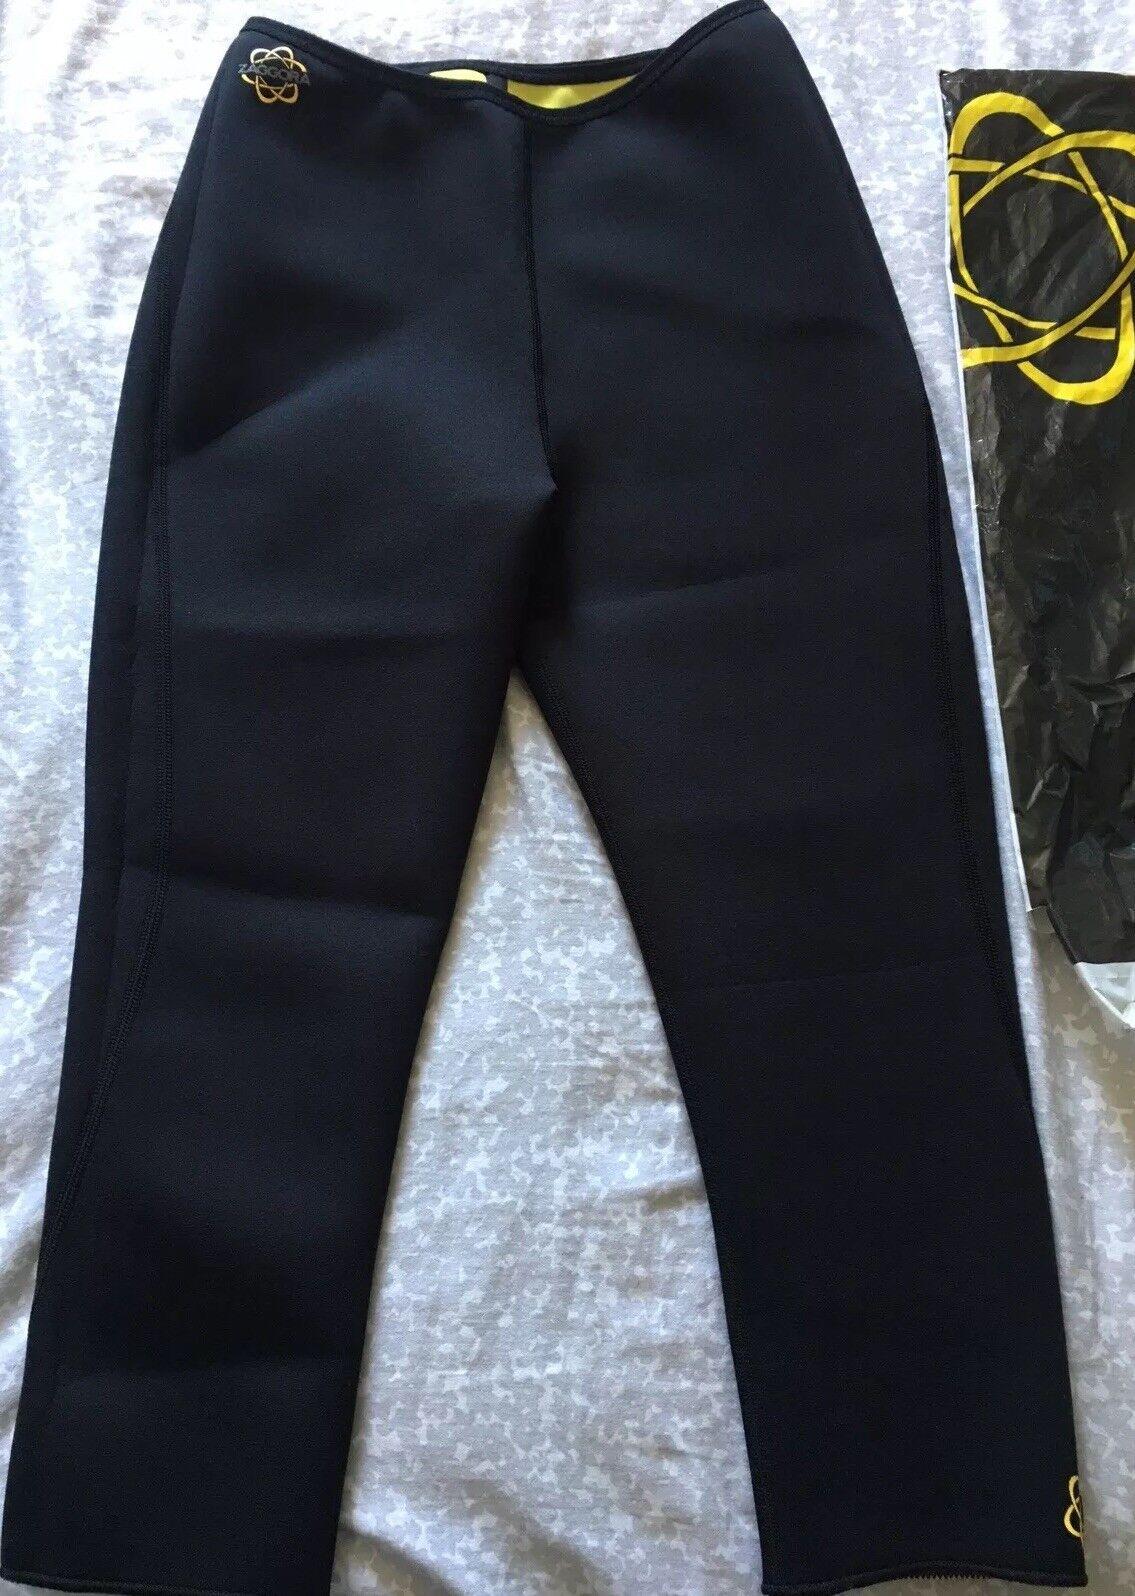 BNWT Zaggora Nero Capri Celu-lite tecnologia Allenamento Pantaloni Taglia M